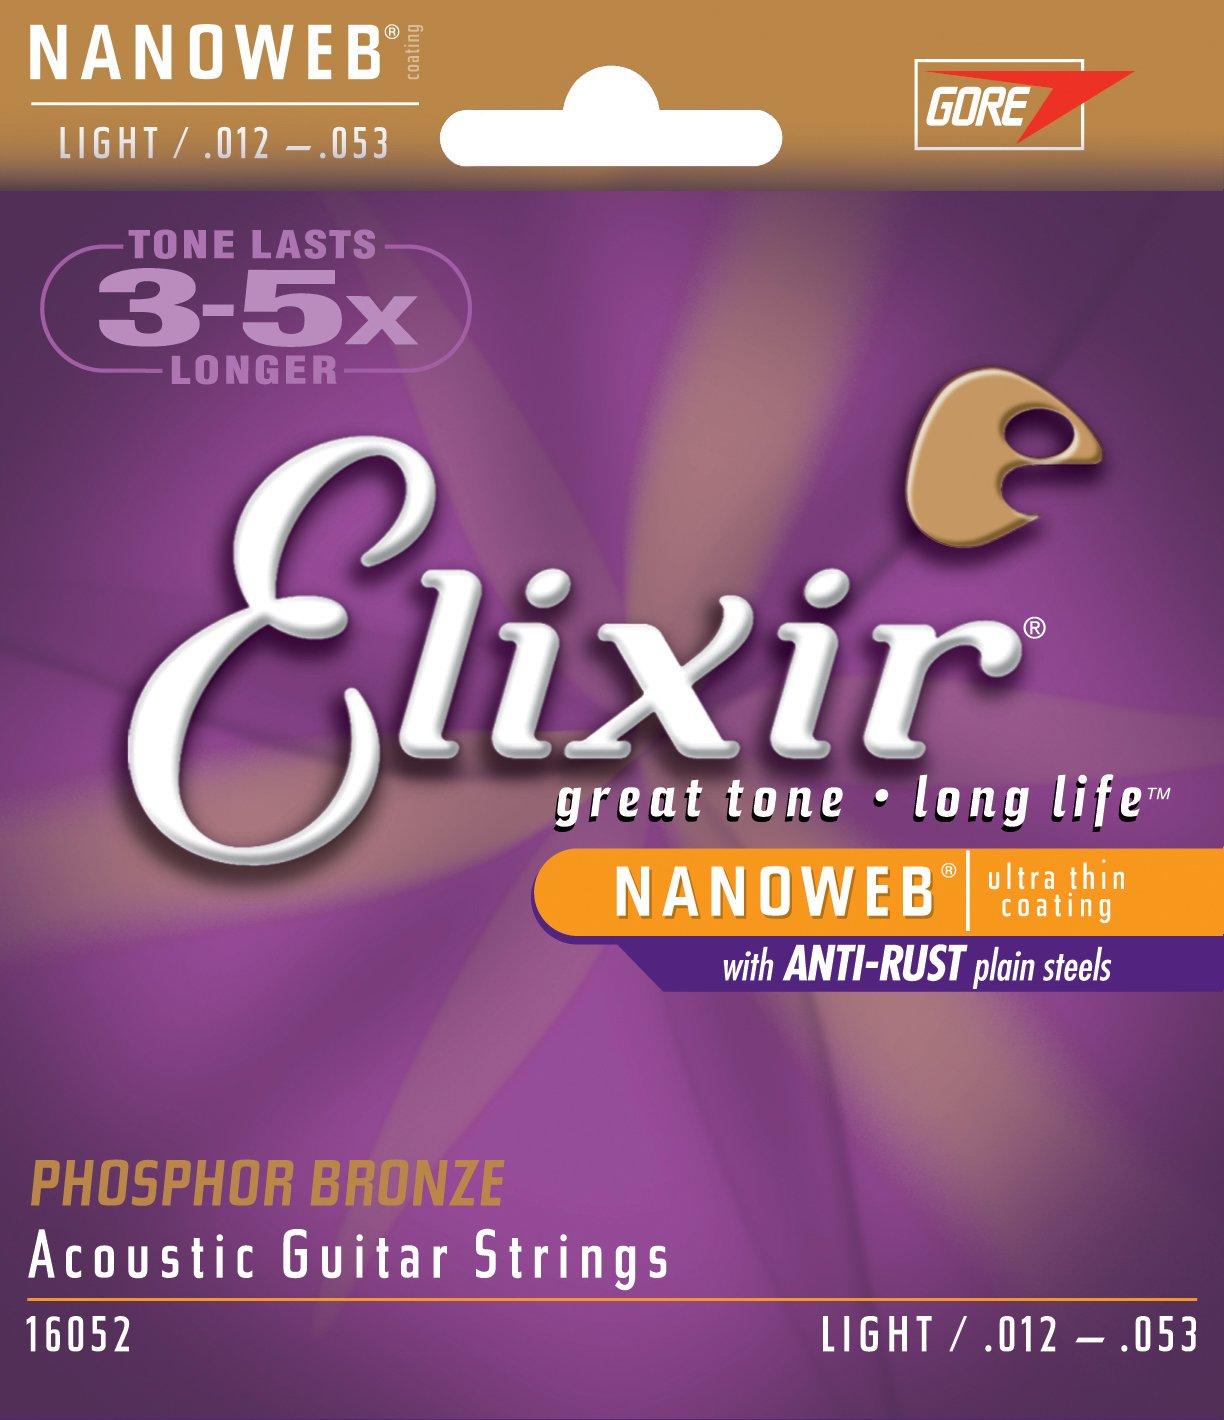 Elixir Strings Acoustic Phosphor Bronze Guitar Strings with NANOWEB Coating, Light (.012-.053)